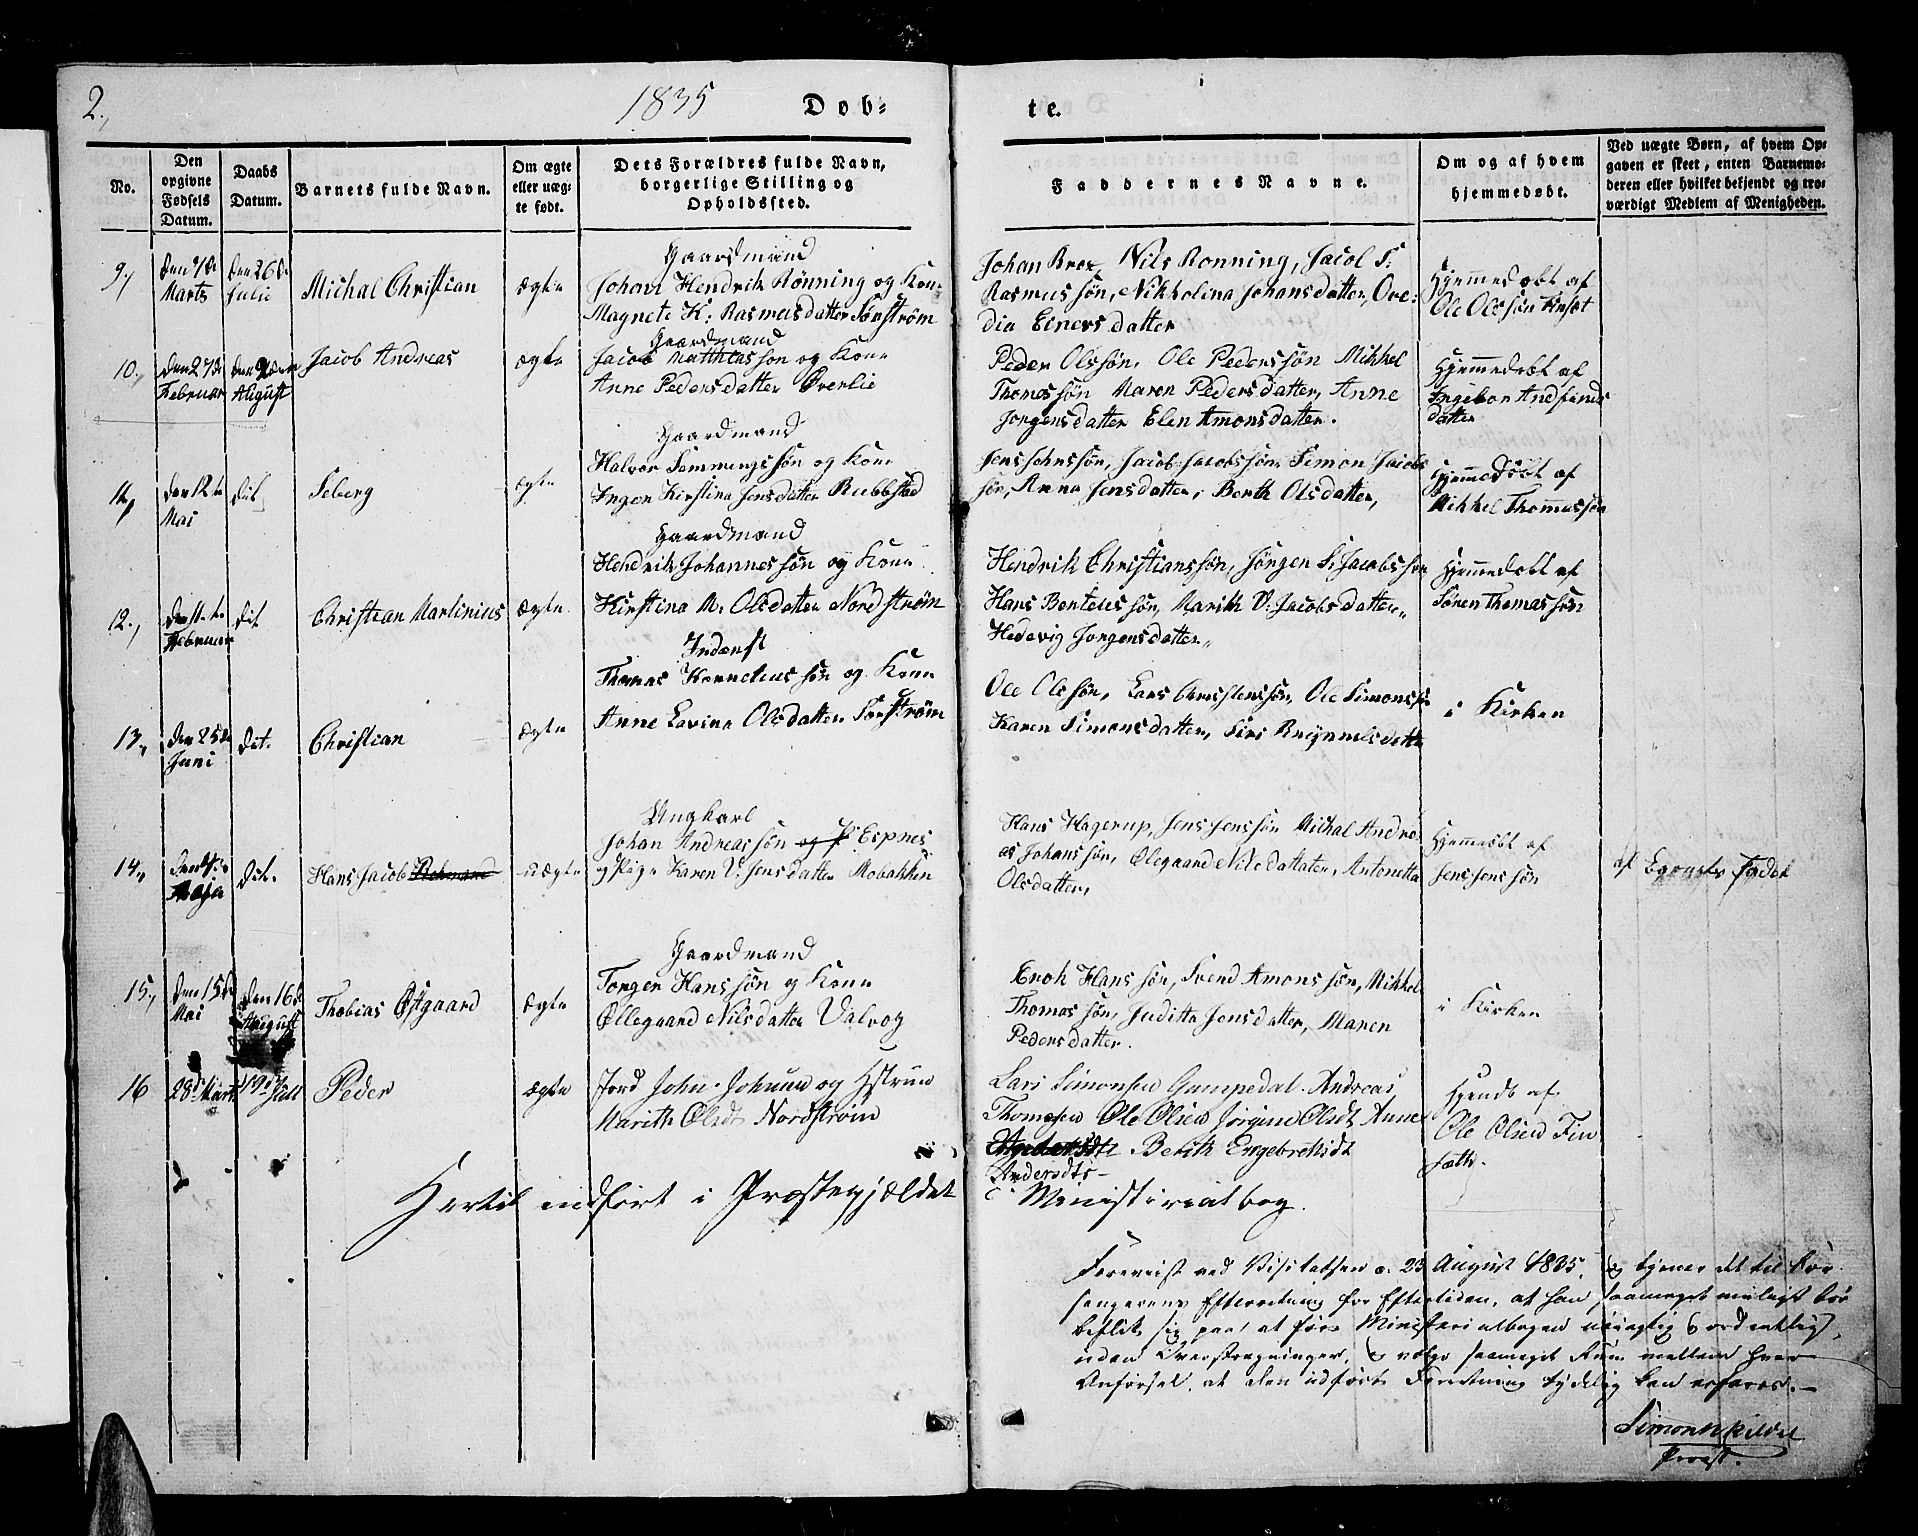 SATØ, Tranøy sokneprestkontor, I/Ia/Iab/L0001klokker: Klokkerbok nr. 1, 1835-1853, s. 2